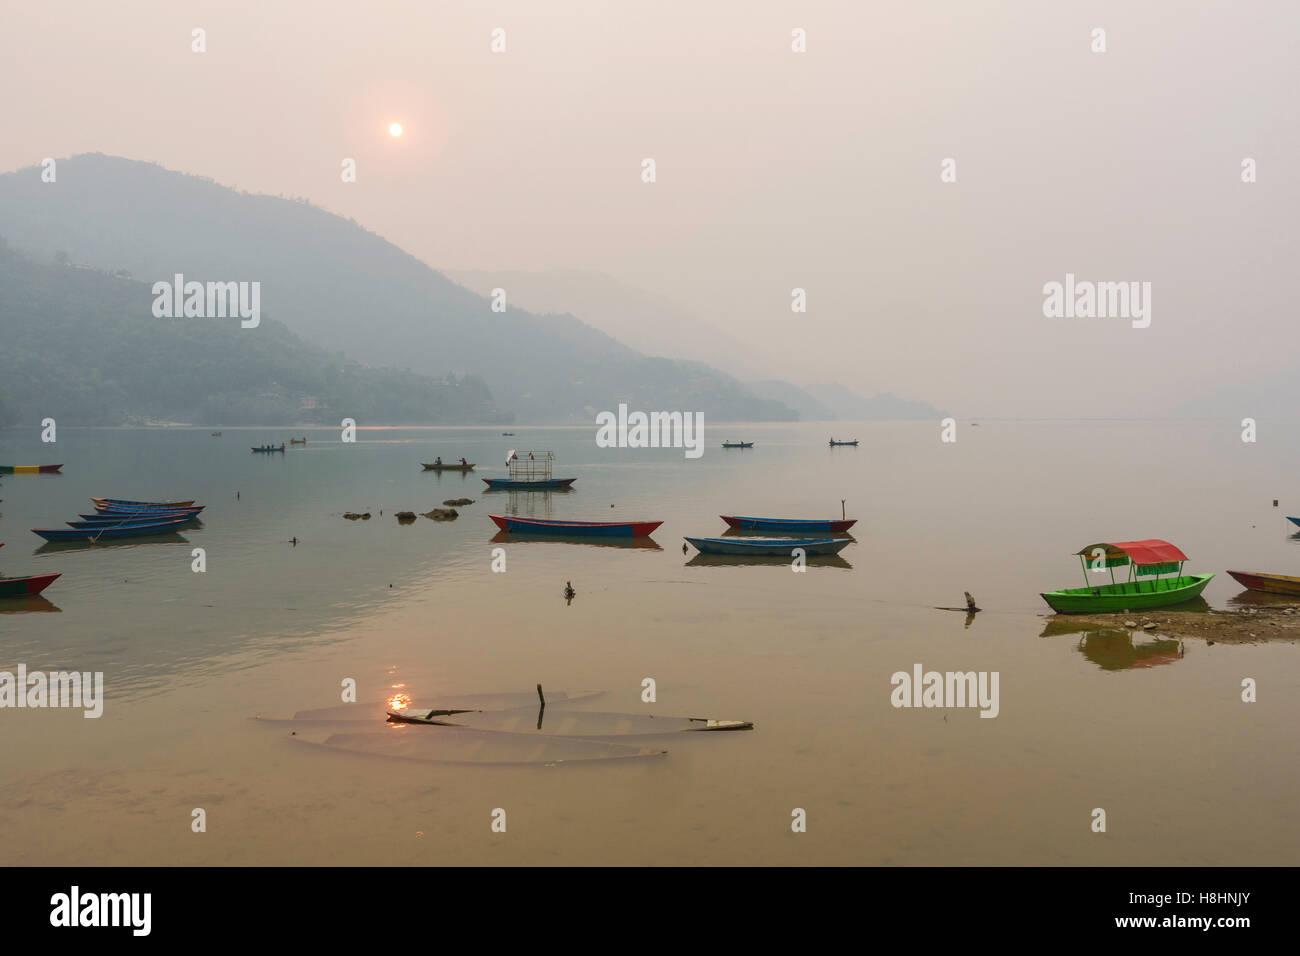 Phewa Lake by a hazy day in Pokhara, Nepal - Stock Image